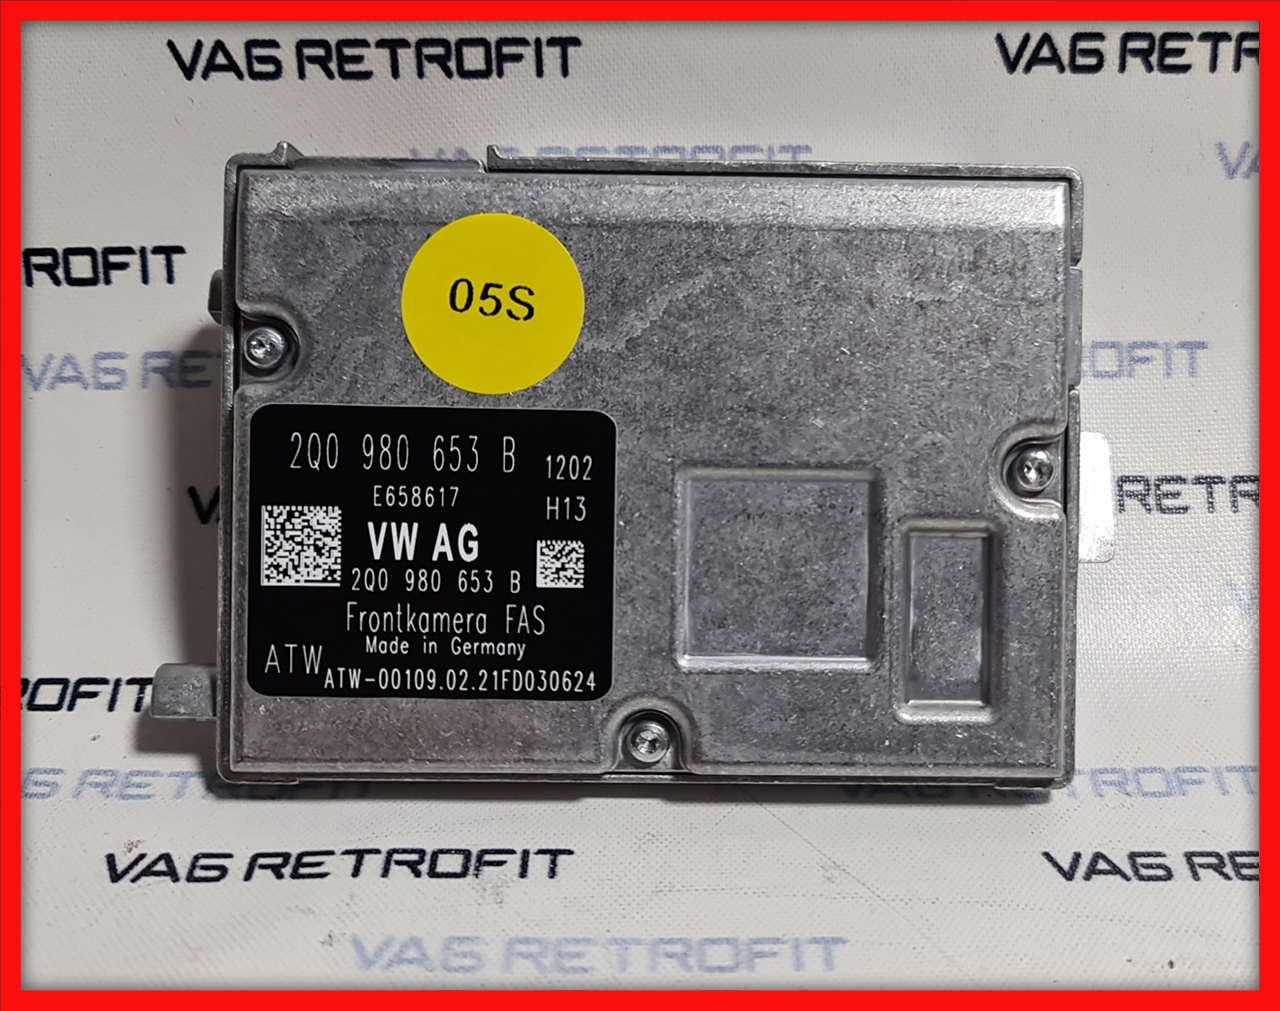 Poza 5 - Camera Video Frontala Parbriz 2Q0980653B 2Q0 980 653 B VW Golf Passat SKODA